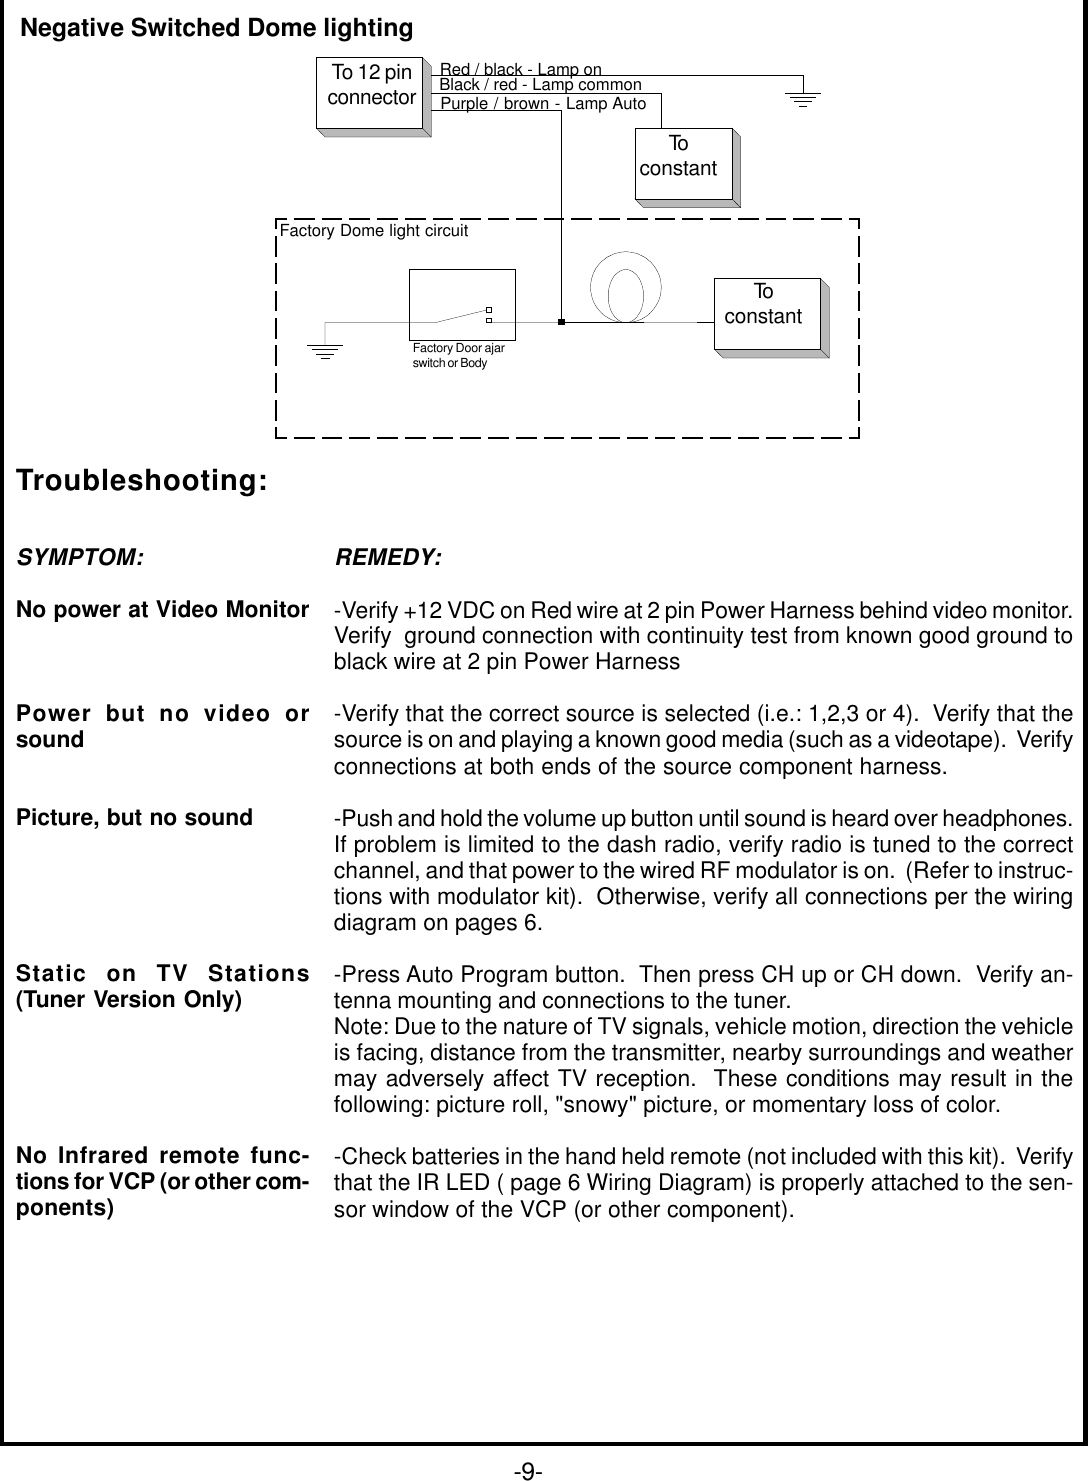 Audiovox Prov716 Prov716s Prov716p Users Manual 1285622b Keyless Entry Wiring Diagrams Page 11 Of 12